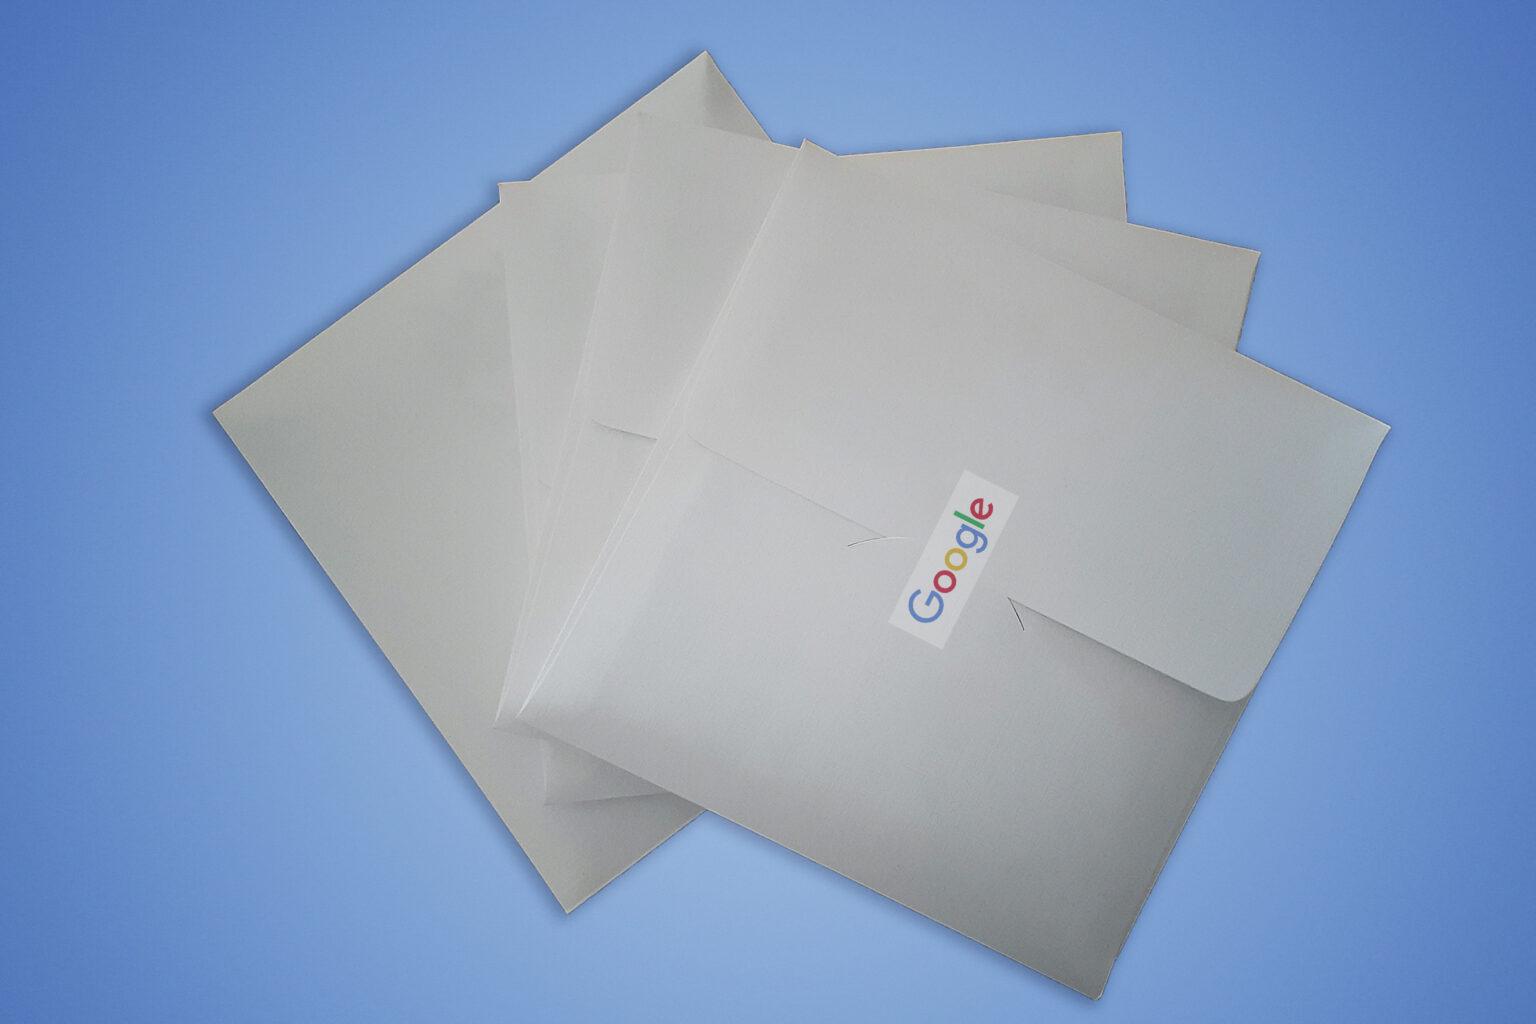 201 Origami Packs (4)s